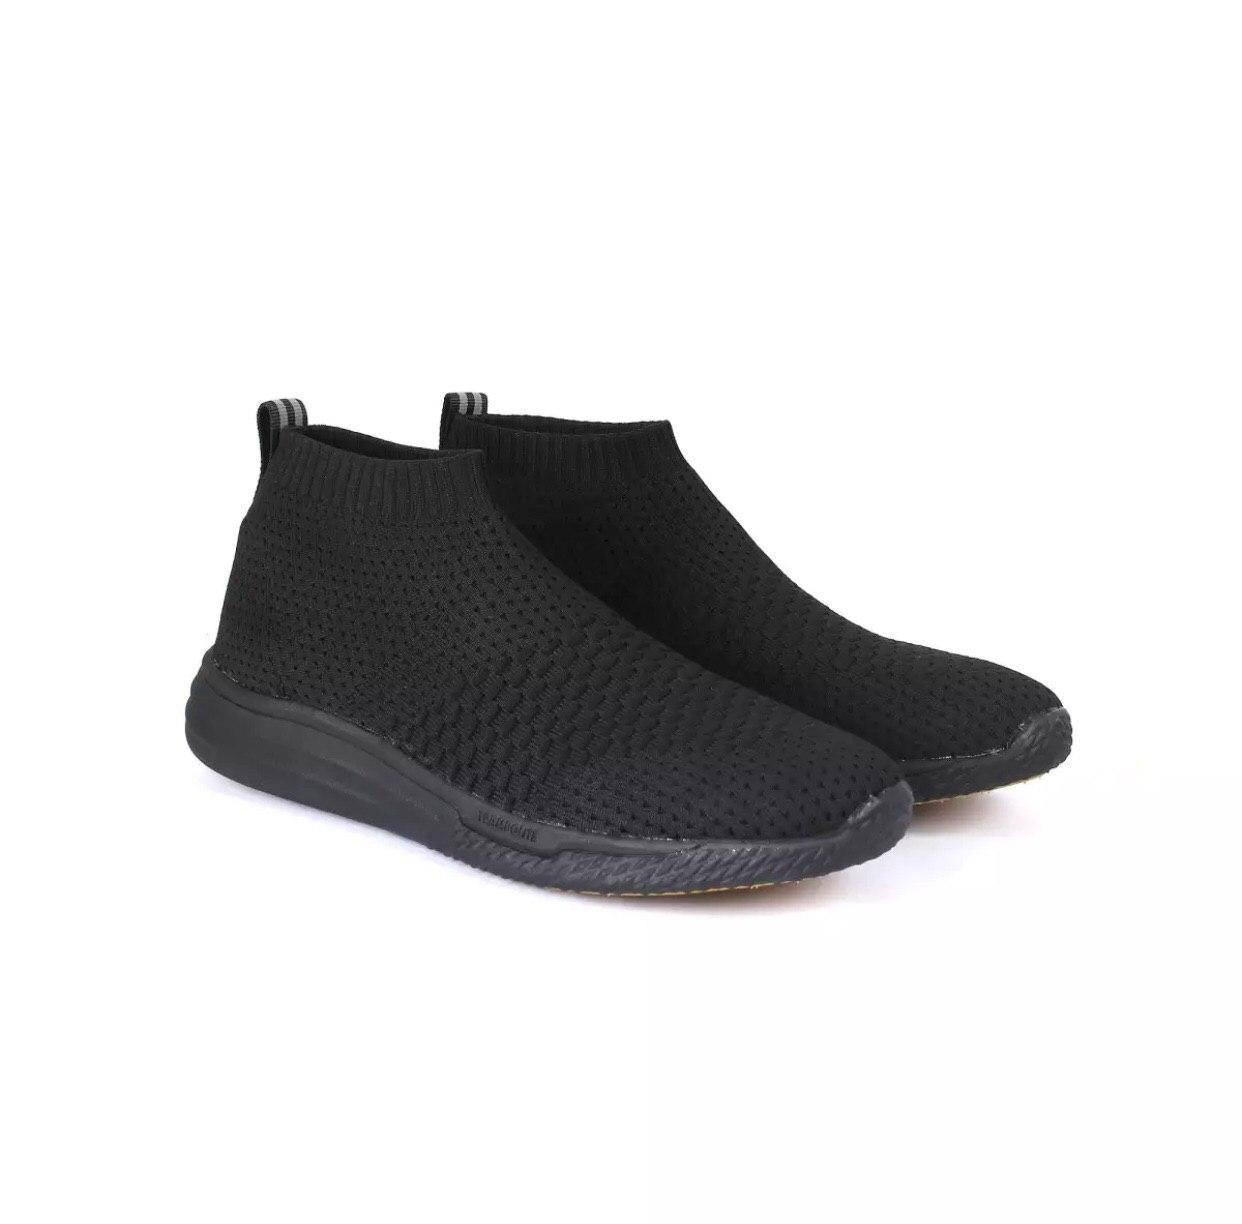 world balance all black shoes